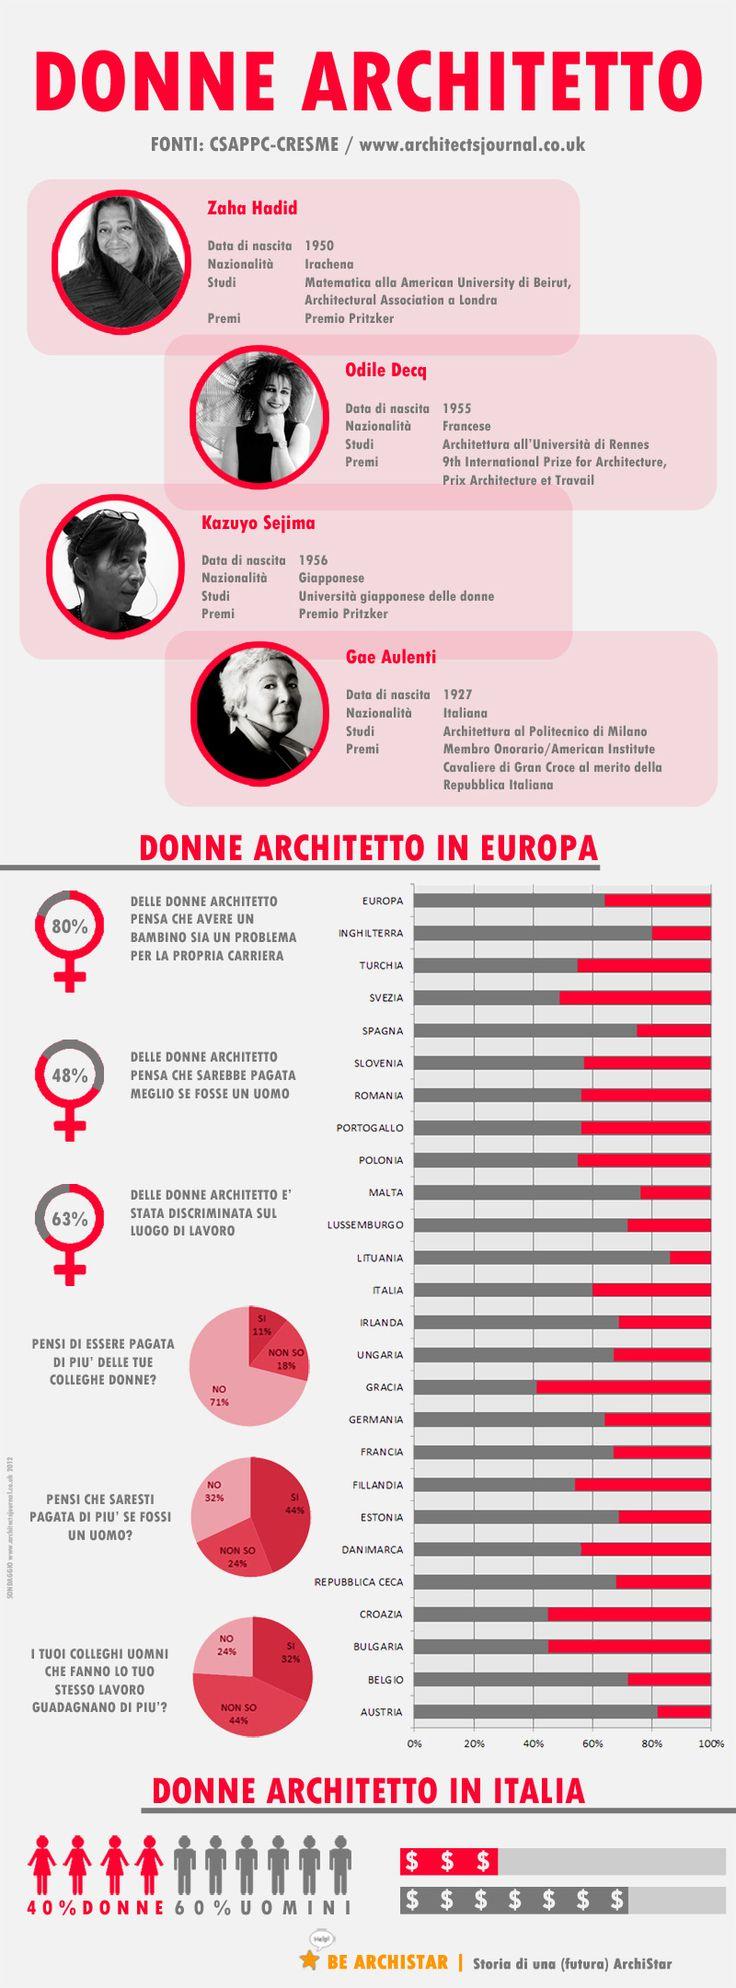 ArchInfo - Donne Architetto